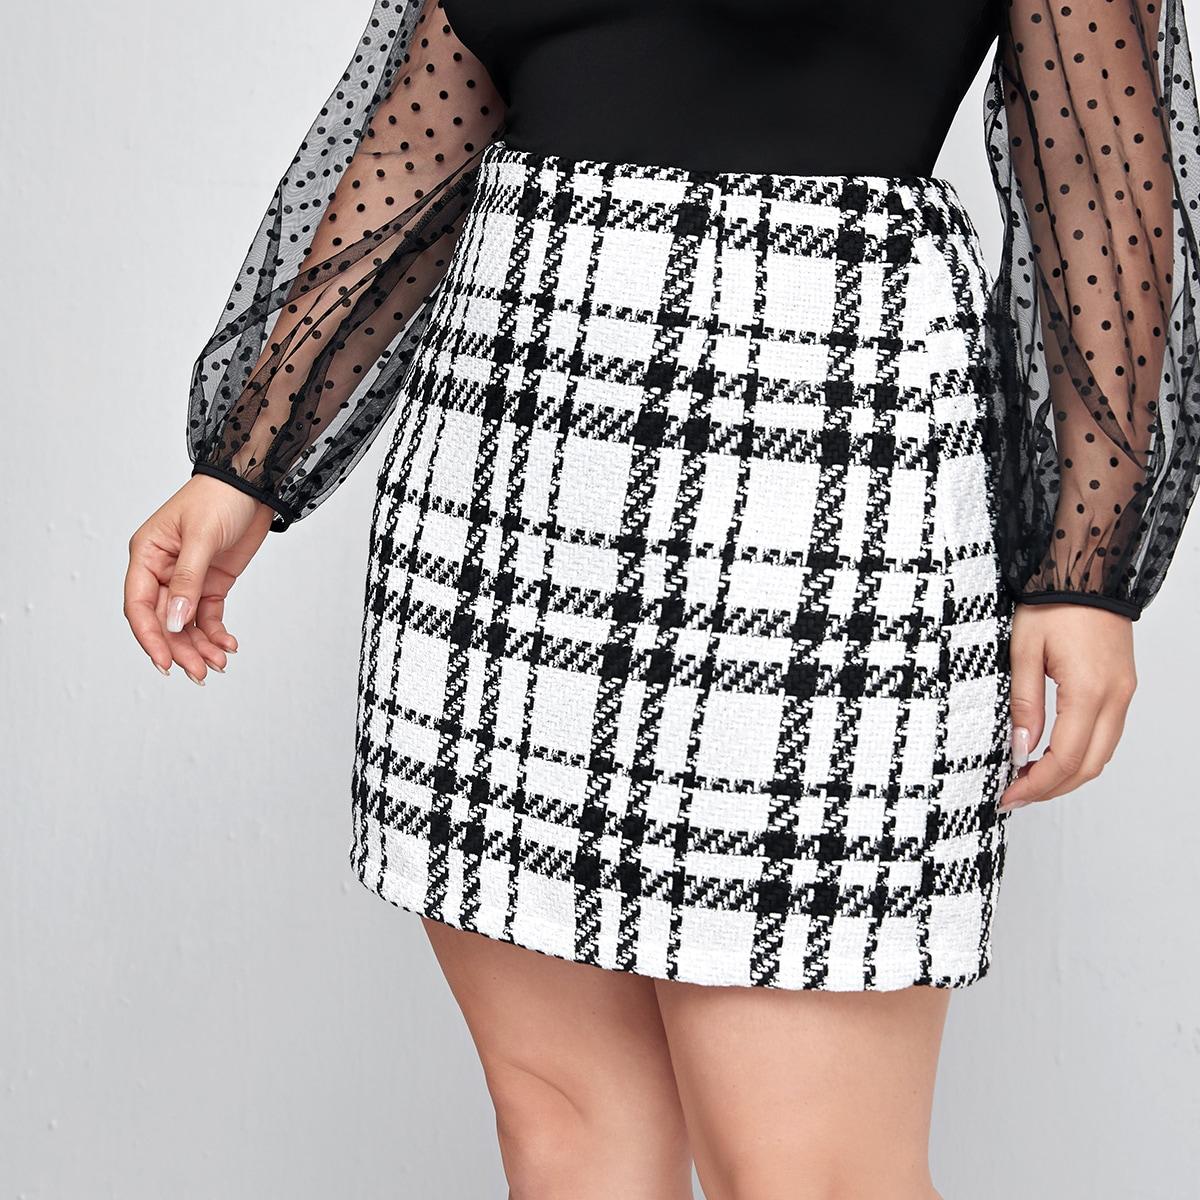 На молнии клетка институтский юбки размер плюс